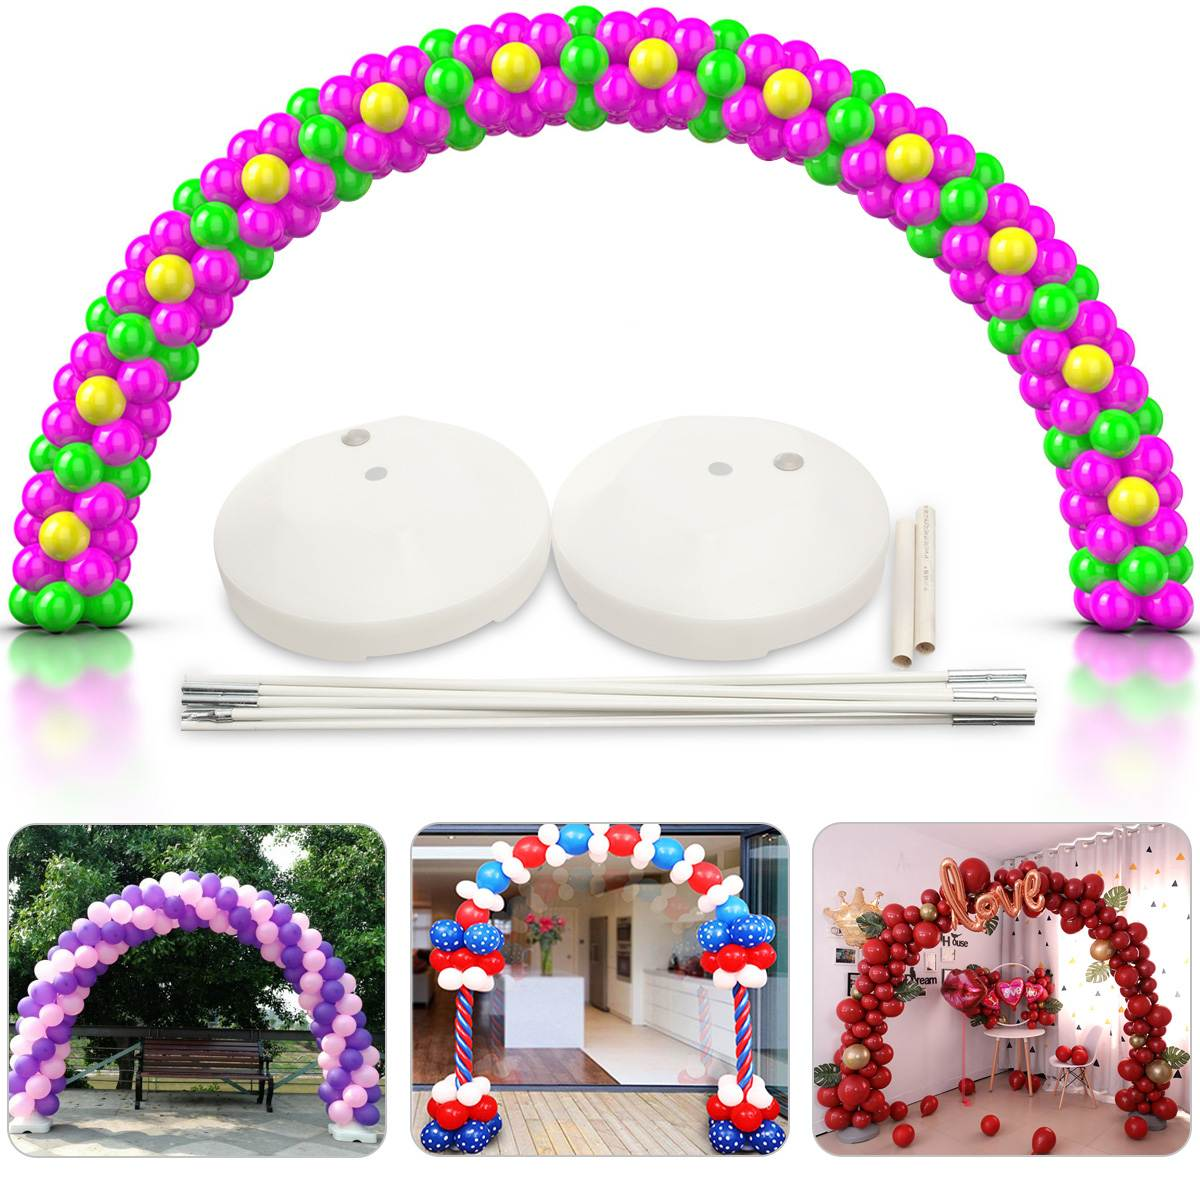 US Balloon Arch Frame Kit Column Water Base Stand Wedding Birthday Party Decor